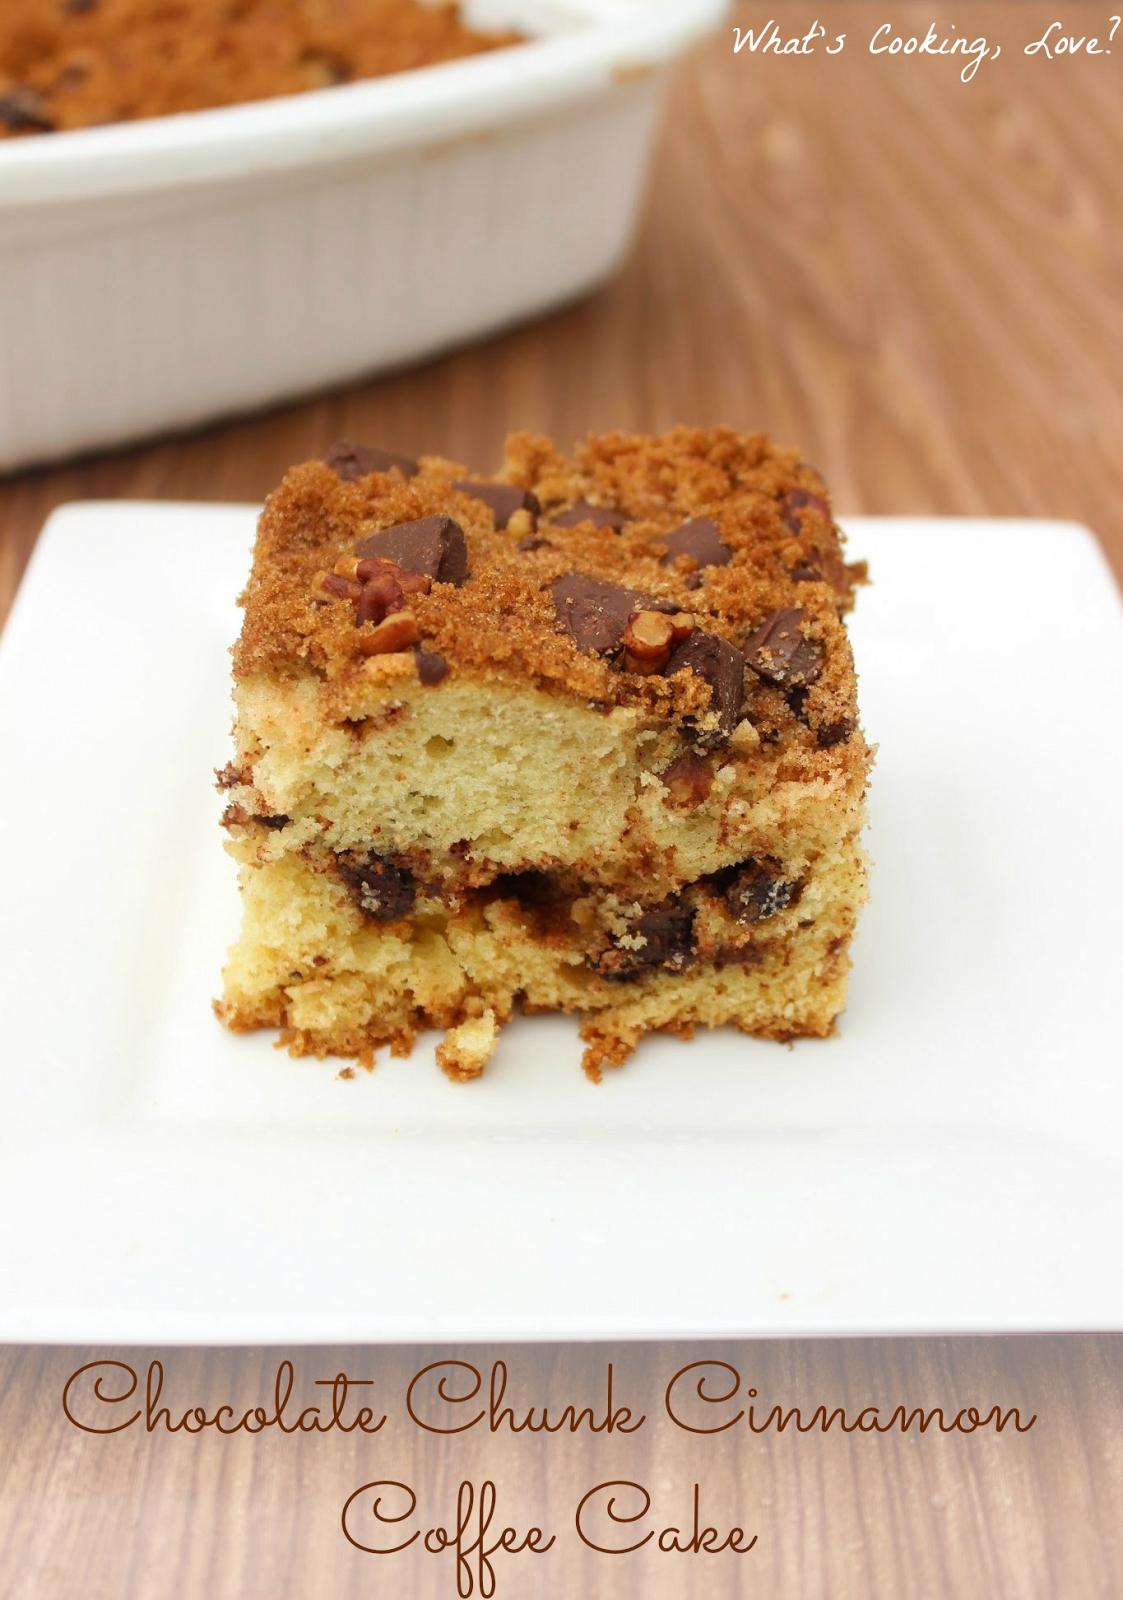 Chocolate Chunk Cinnamon Coffee Cake